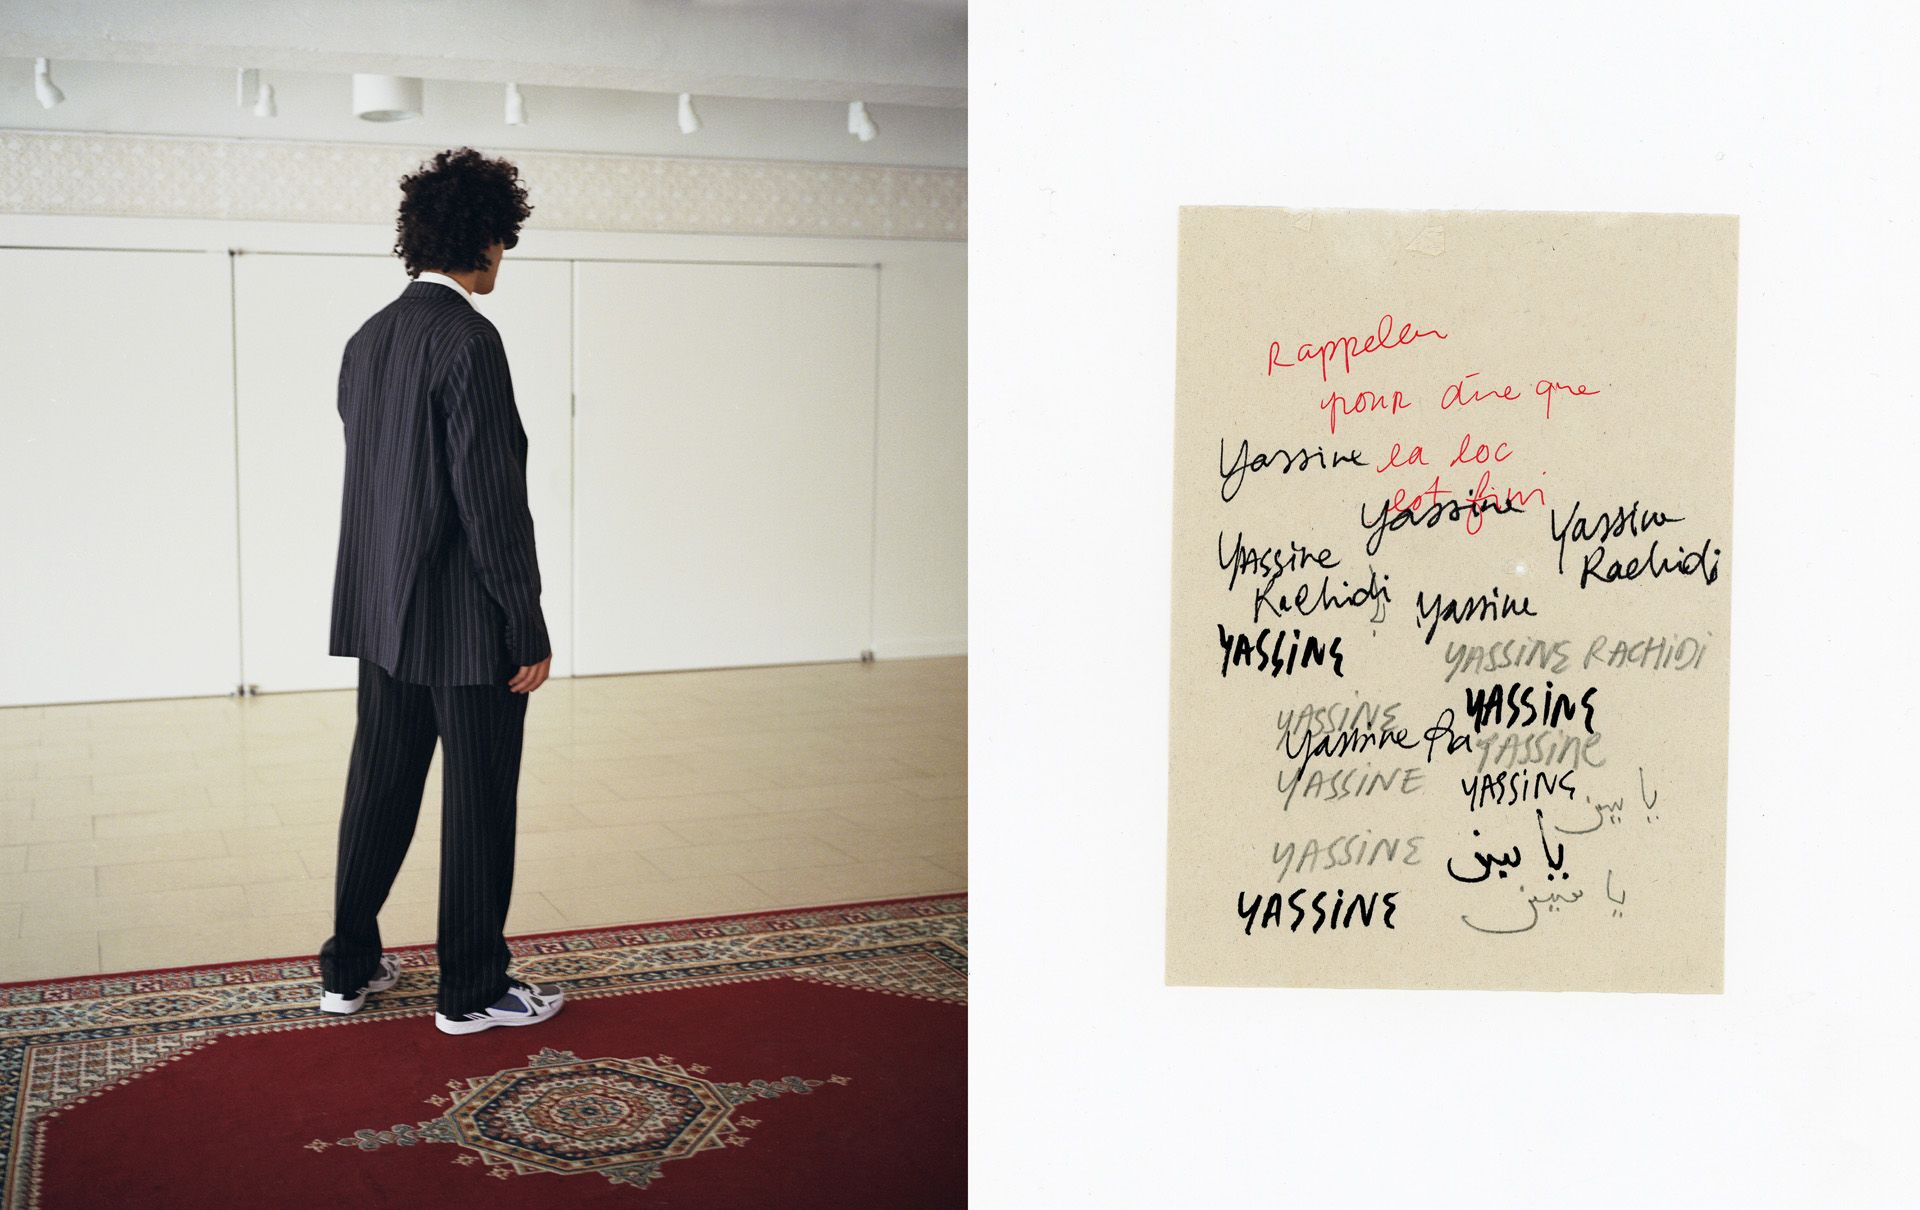 Cheb Yassine by Oumayma B Tanfous